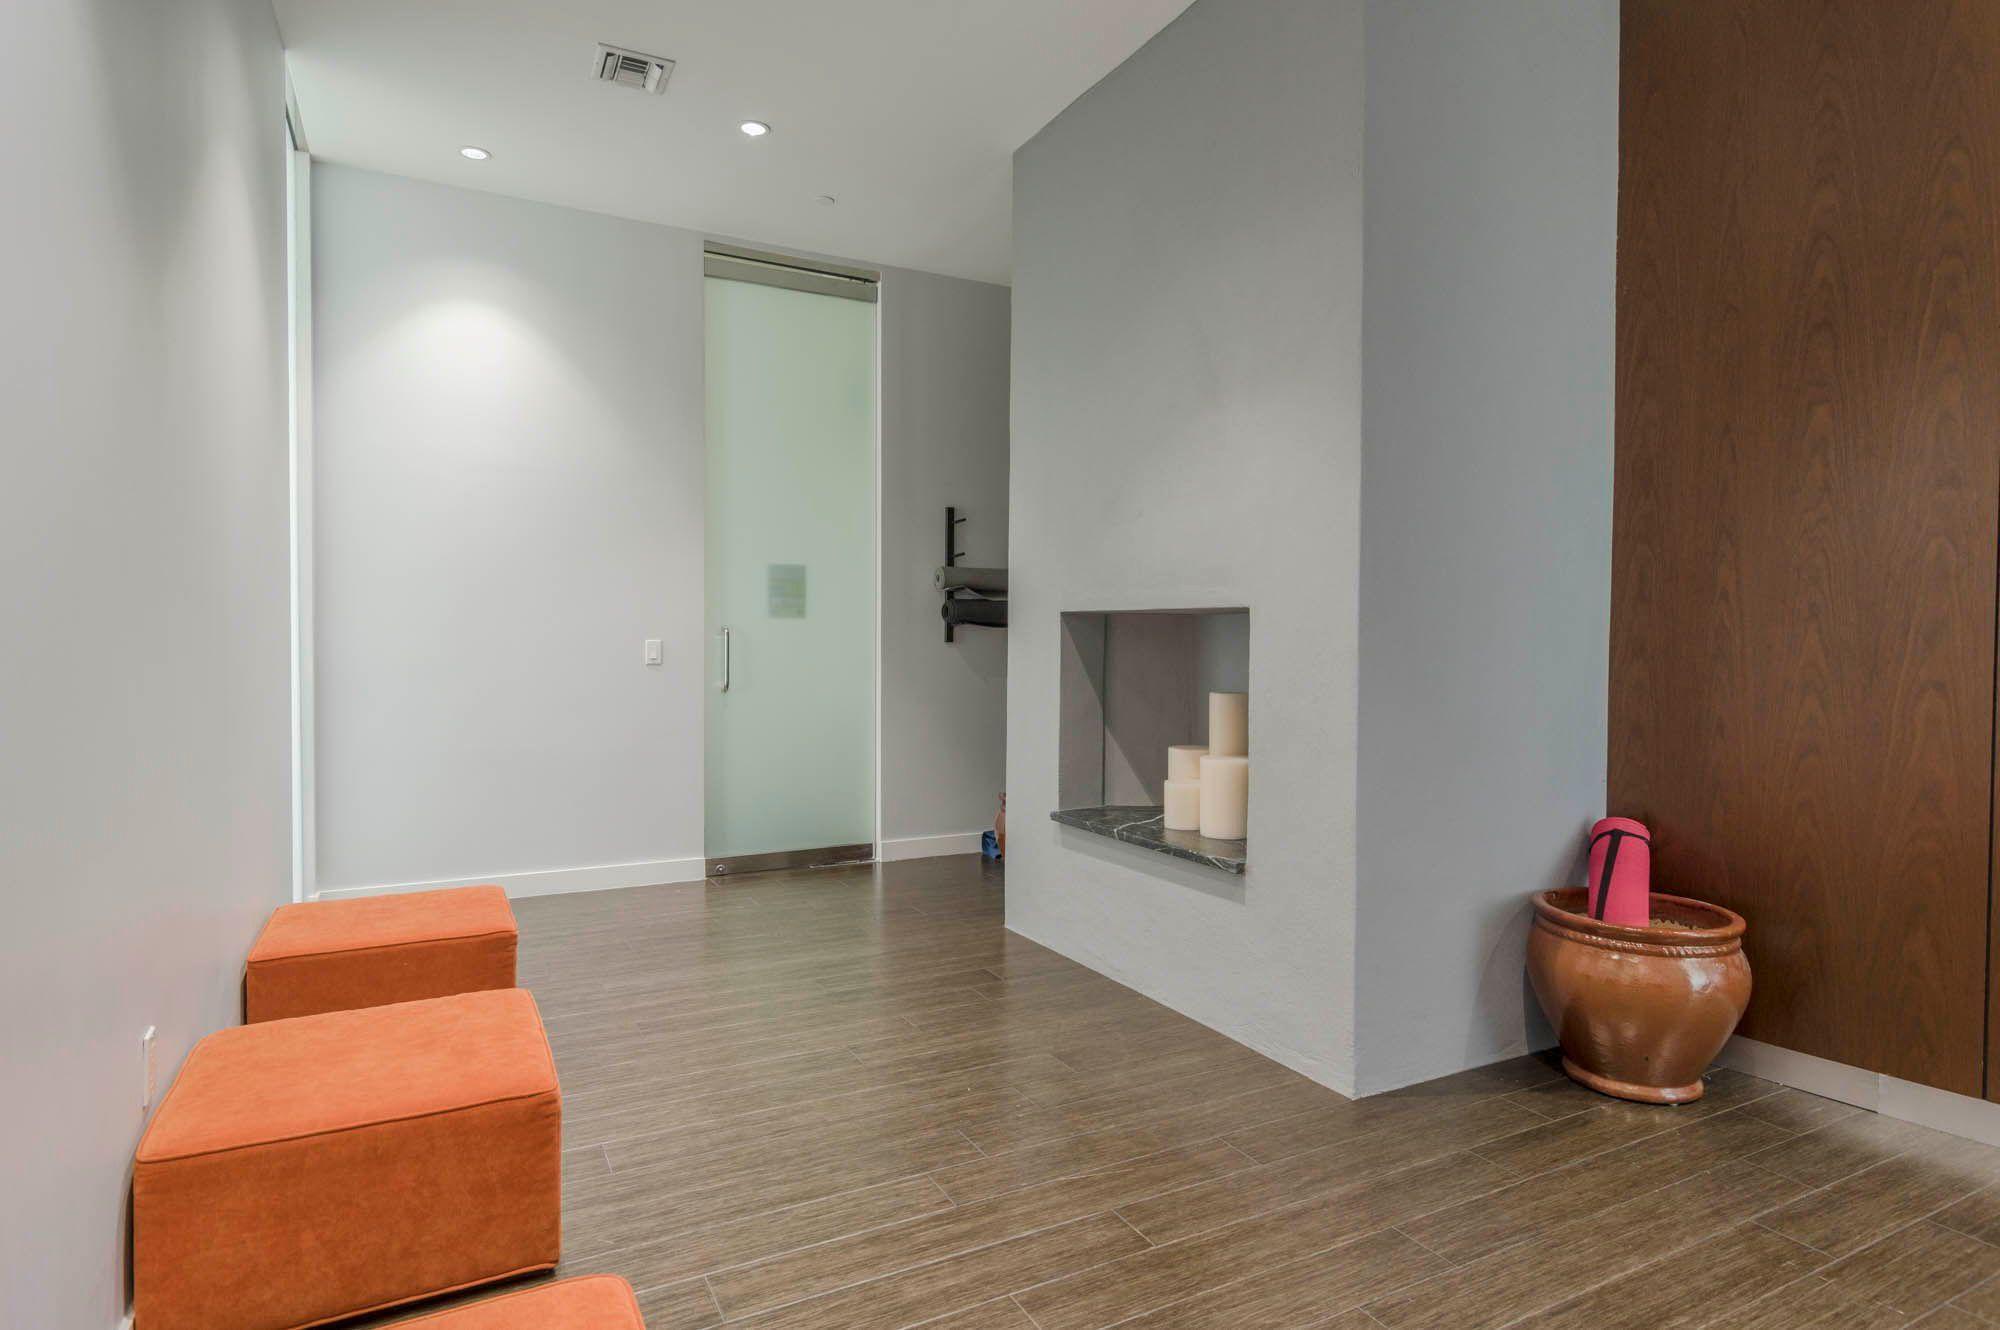 80647c143fc13c1c0c058242ced88071 - Rooms For Rent Palm Beach Gardens Fl